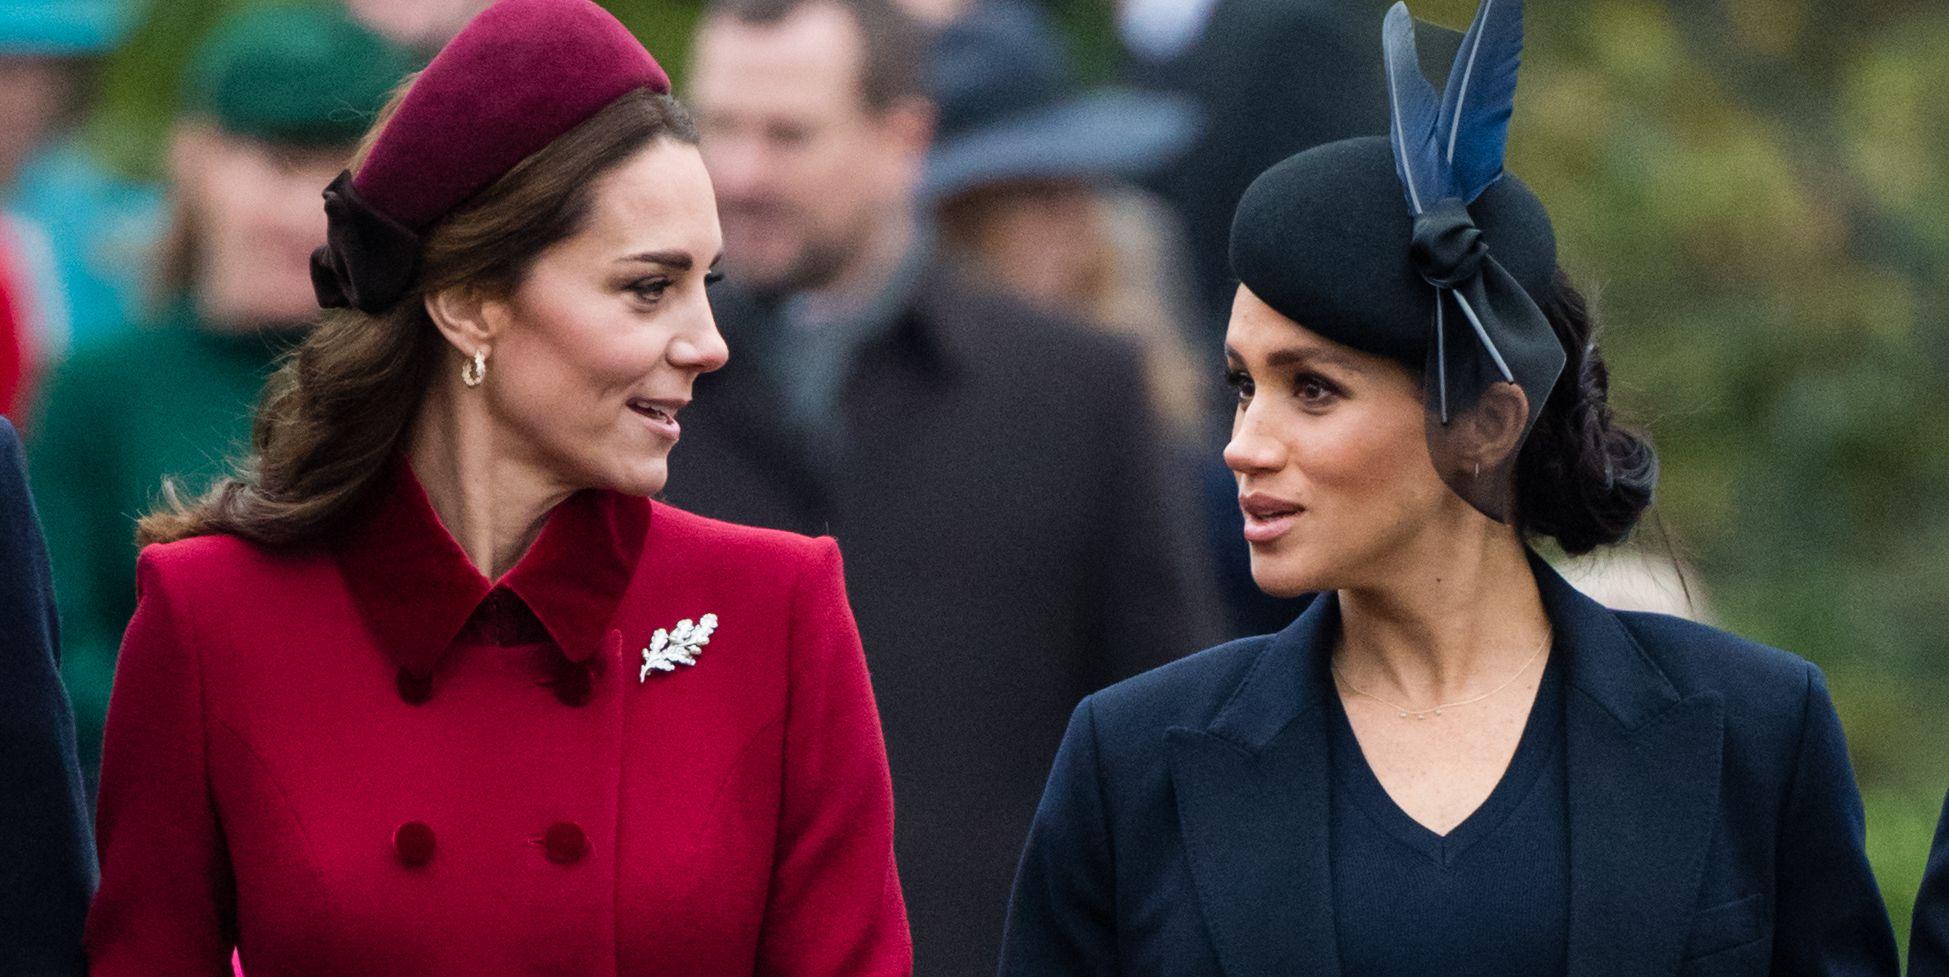 Here's Why Kate Middleton Probably Isn't on Meghan Markle's Godparent Short List